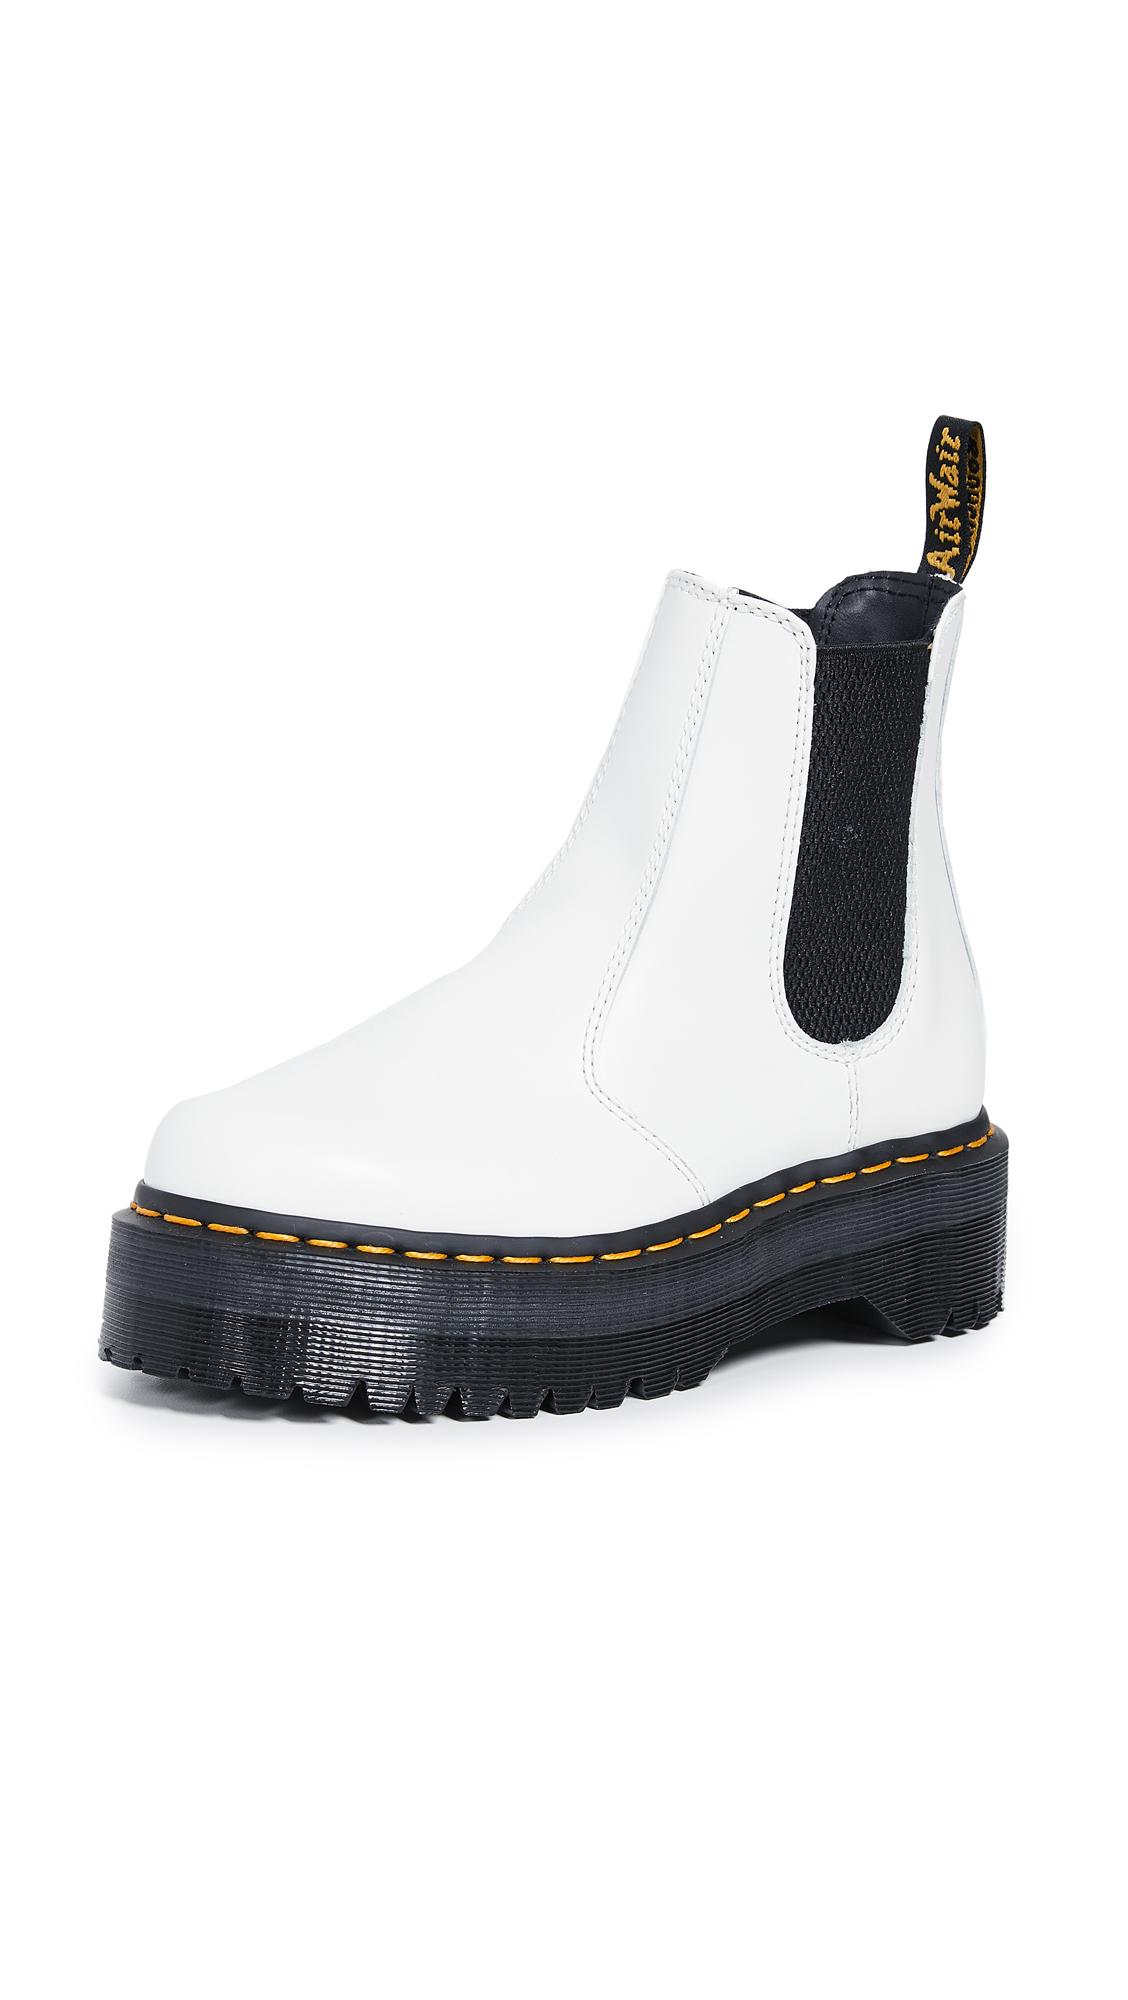 Buy Dr. Martens 2976 Quad Chelsea Boots online, shop Dr. Martens